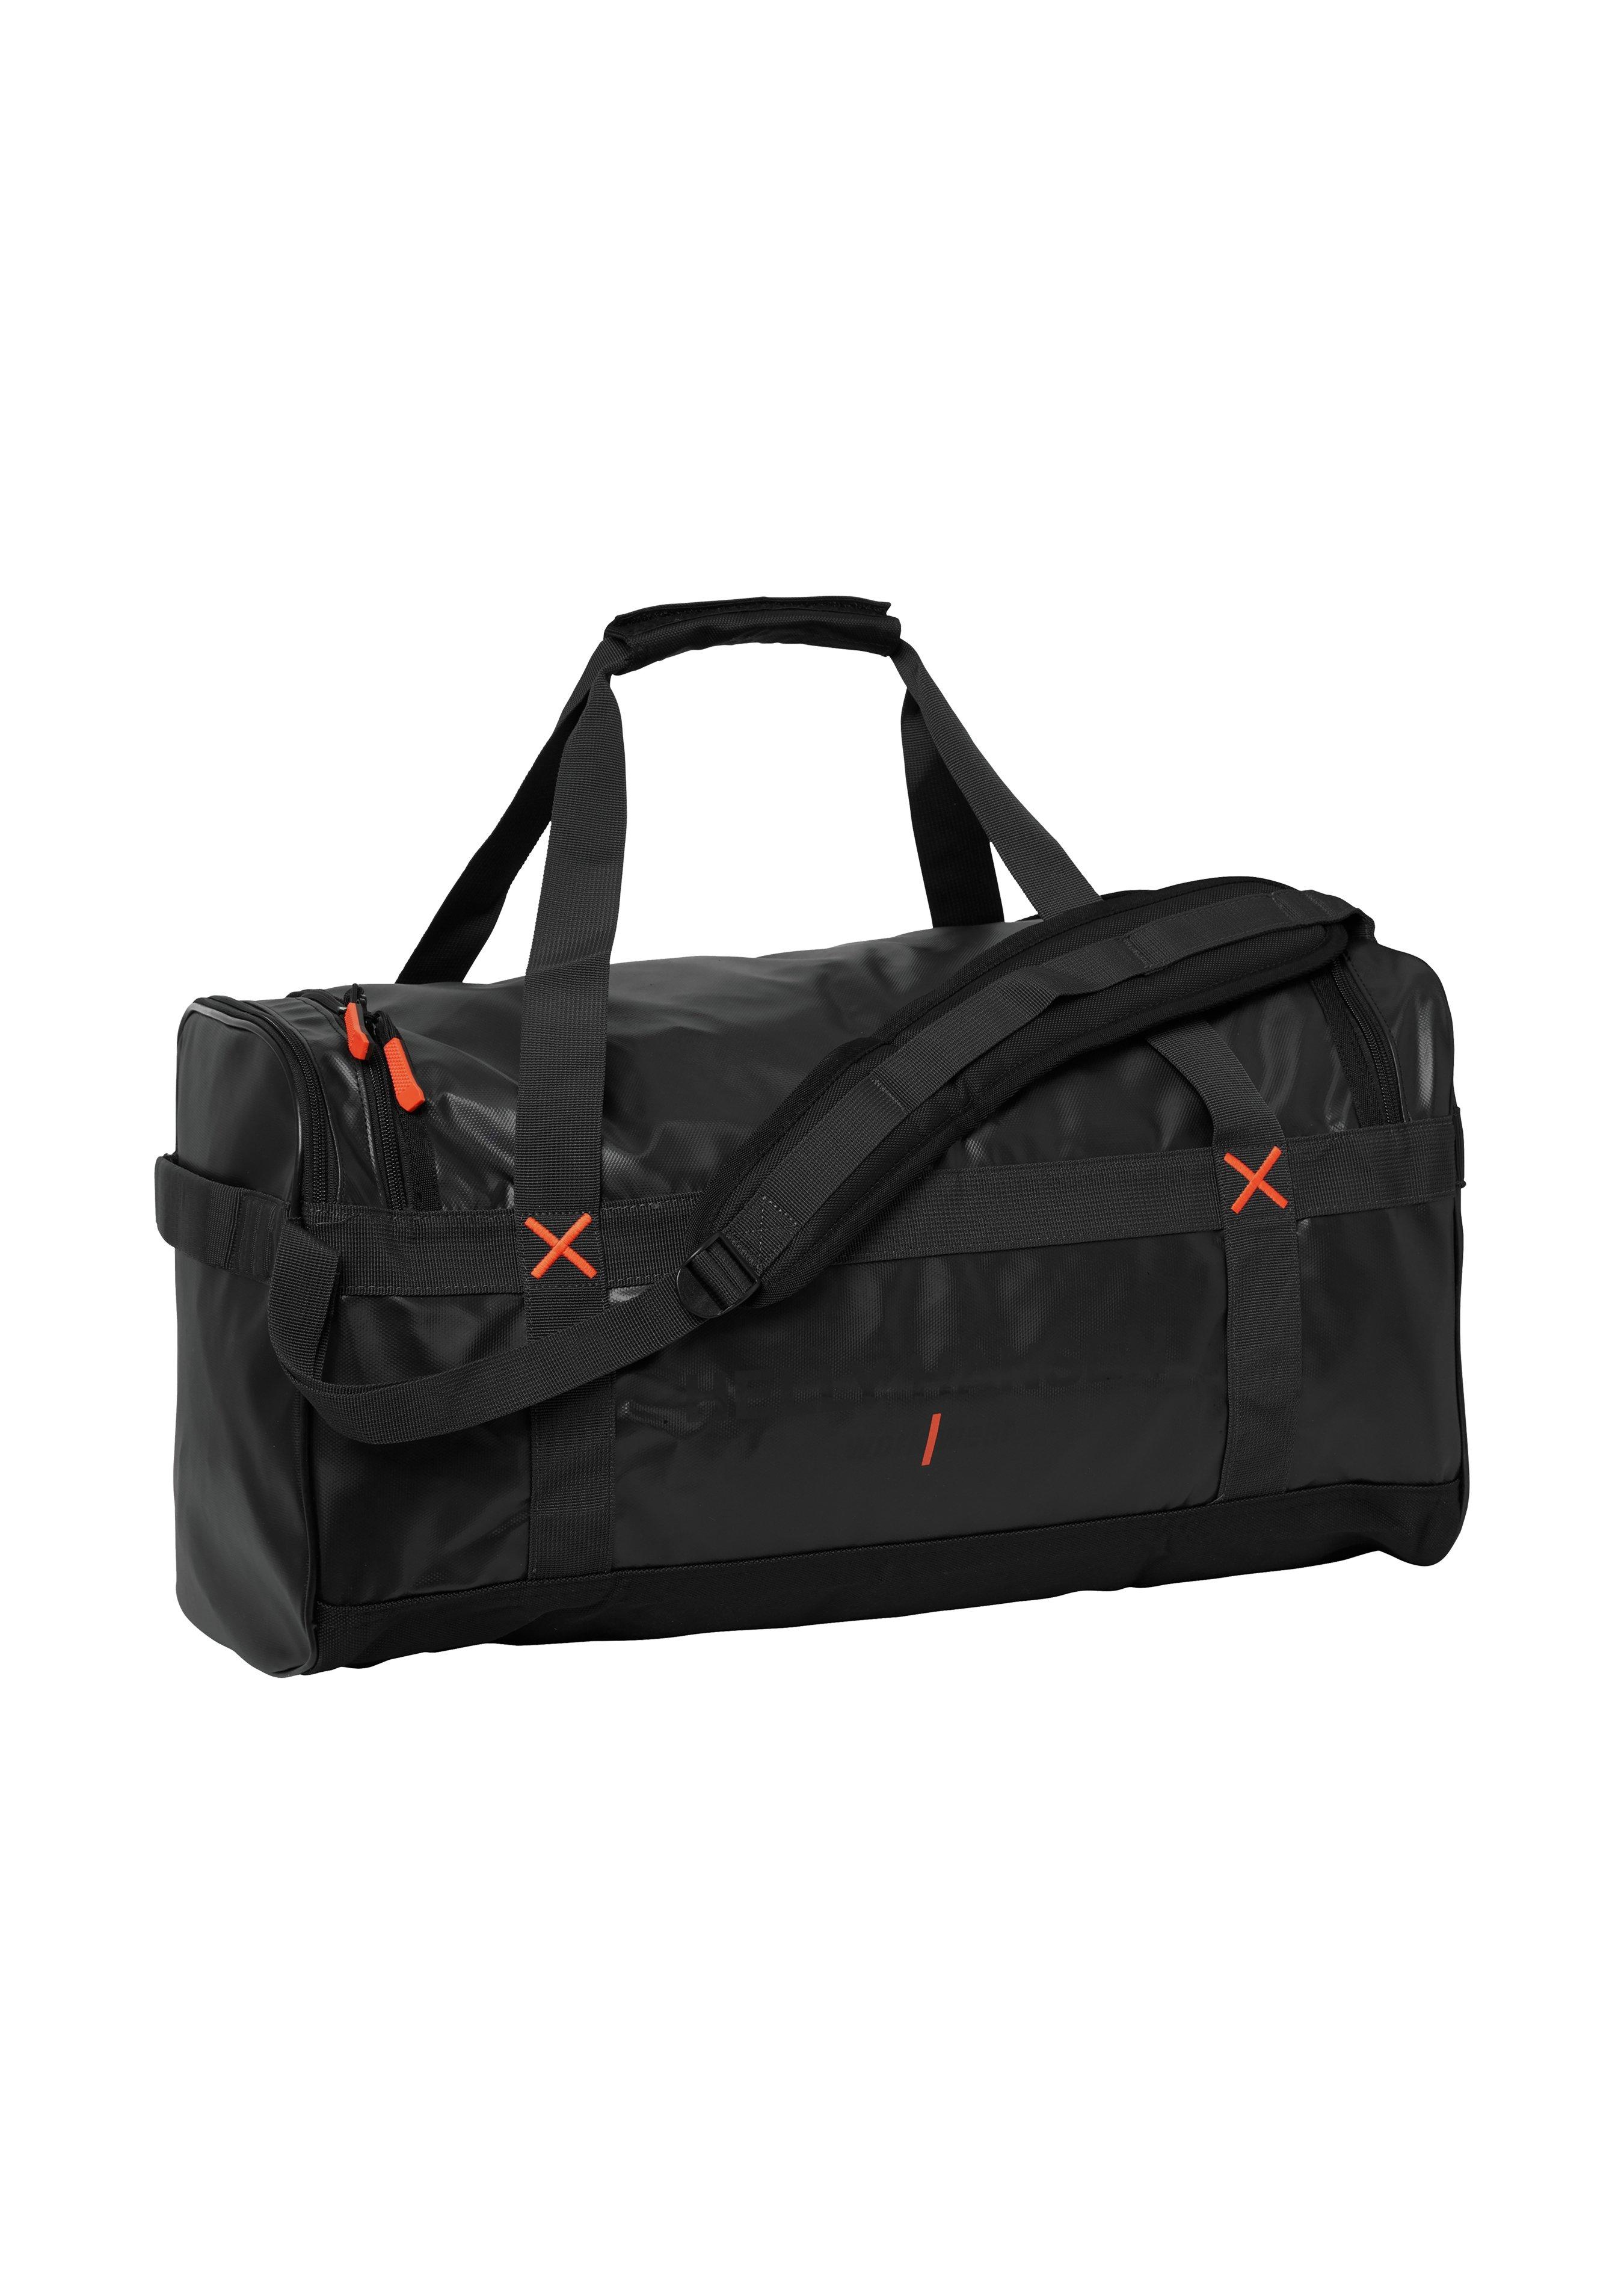 Helly Hansen Tasche Duffel Bag 90 Liter 288110 1